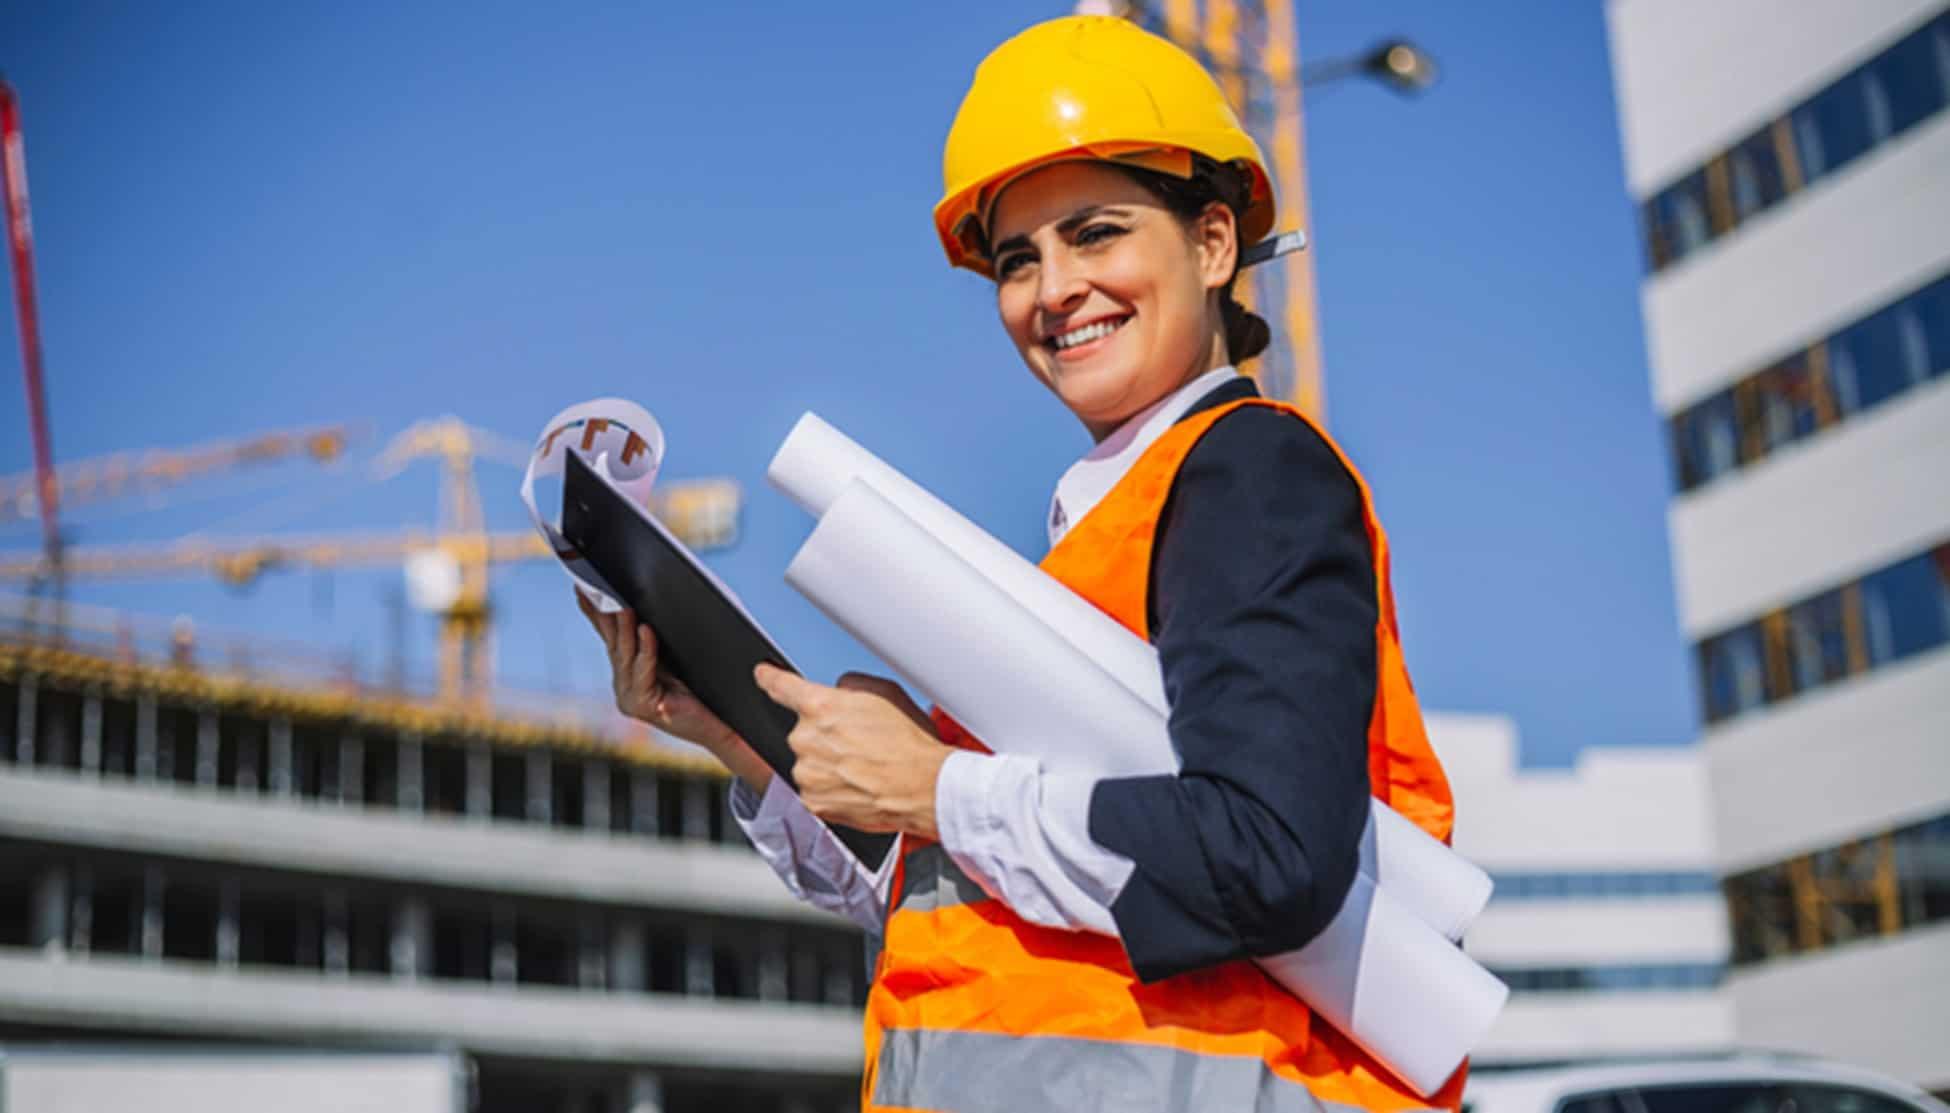 OSHA Certification